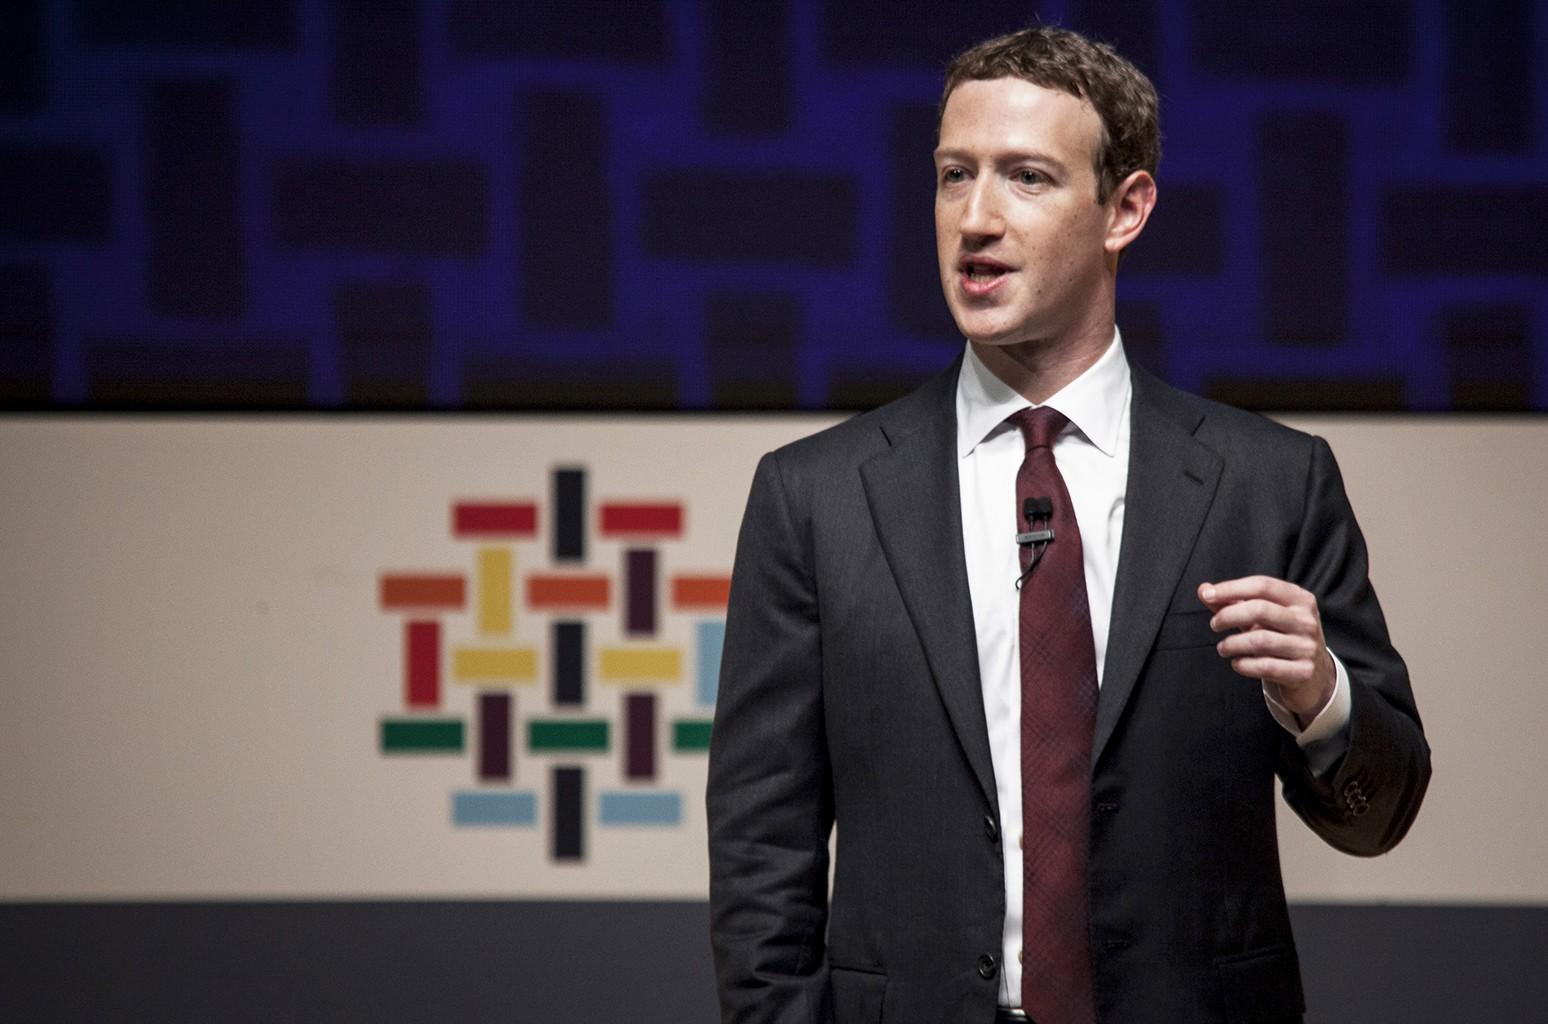 Mark Zuckerberg in 2016